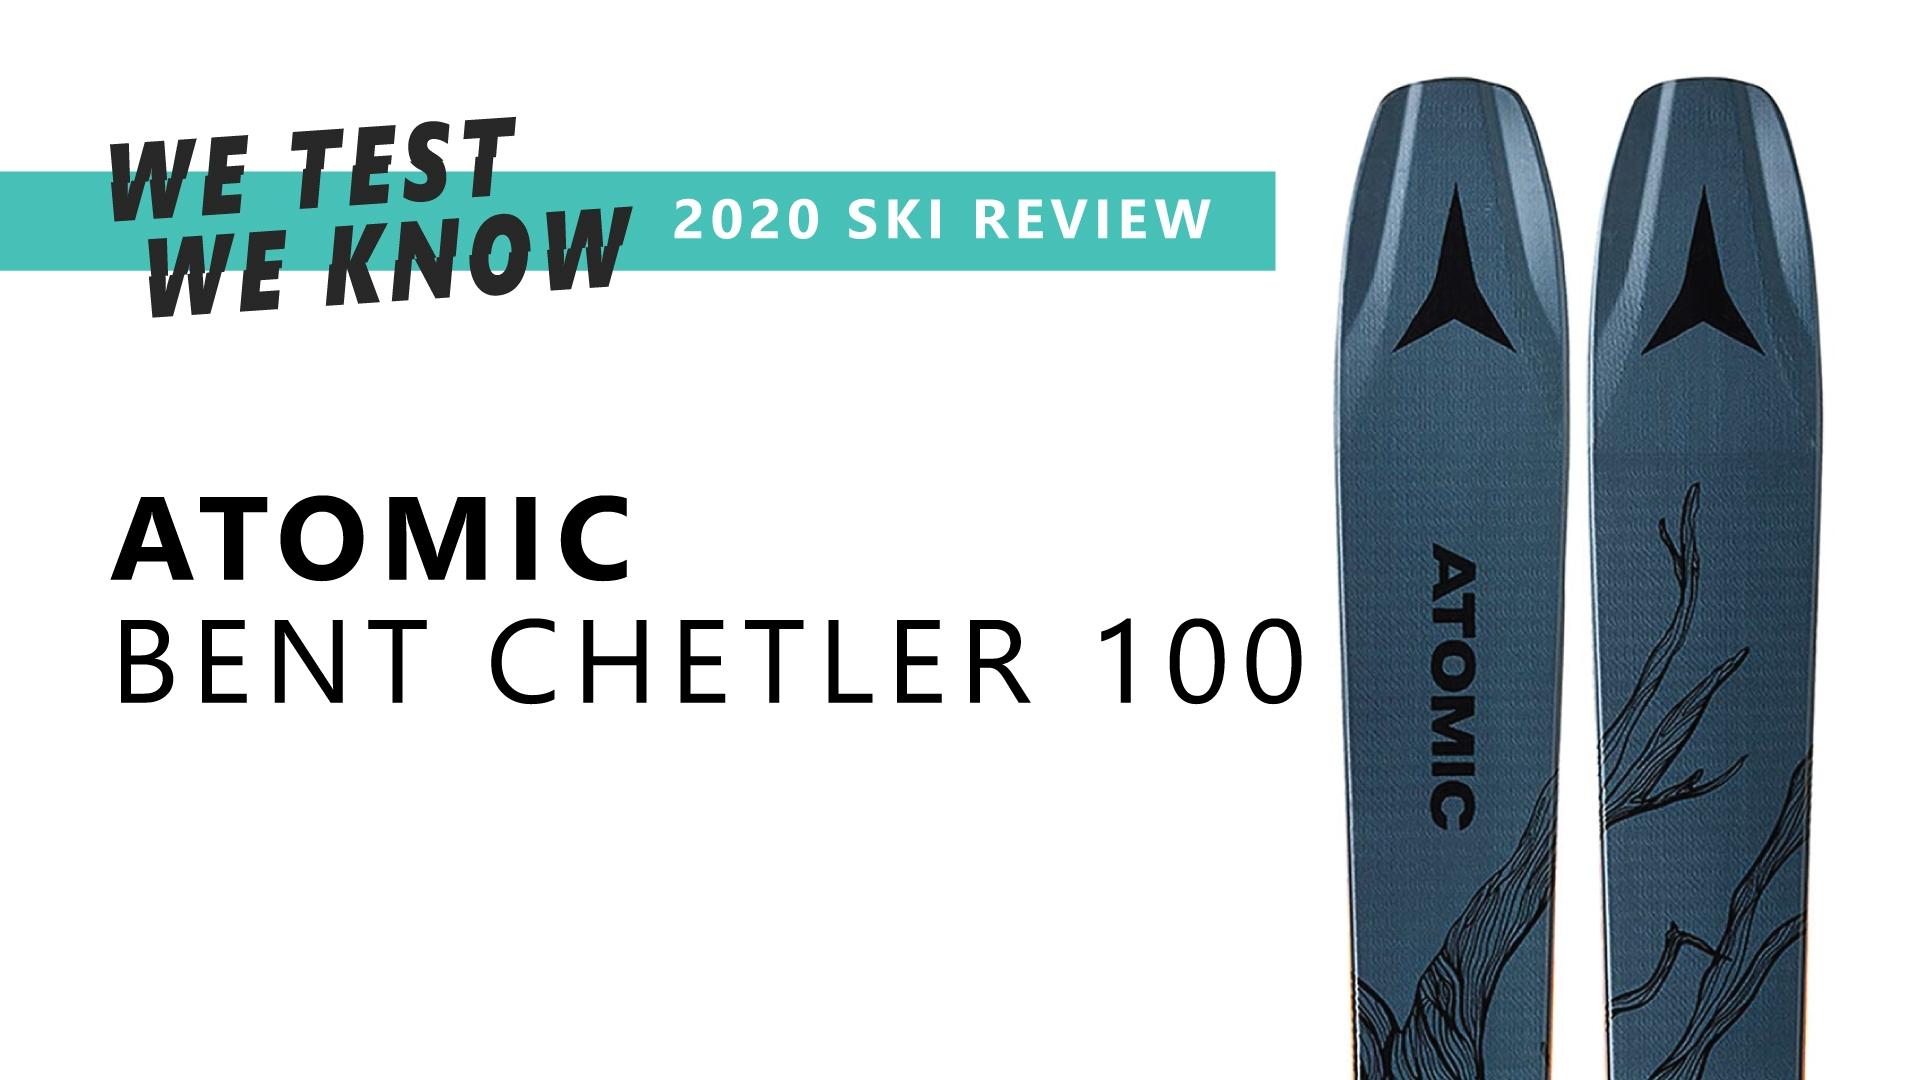 Atomic Bent Chetler 100 - 2020 Ski Review